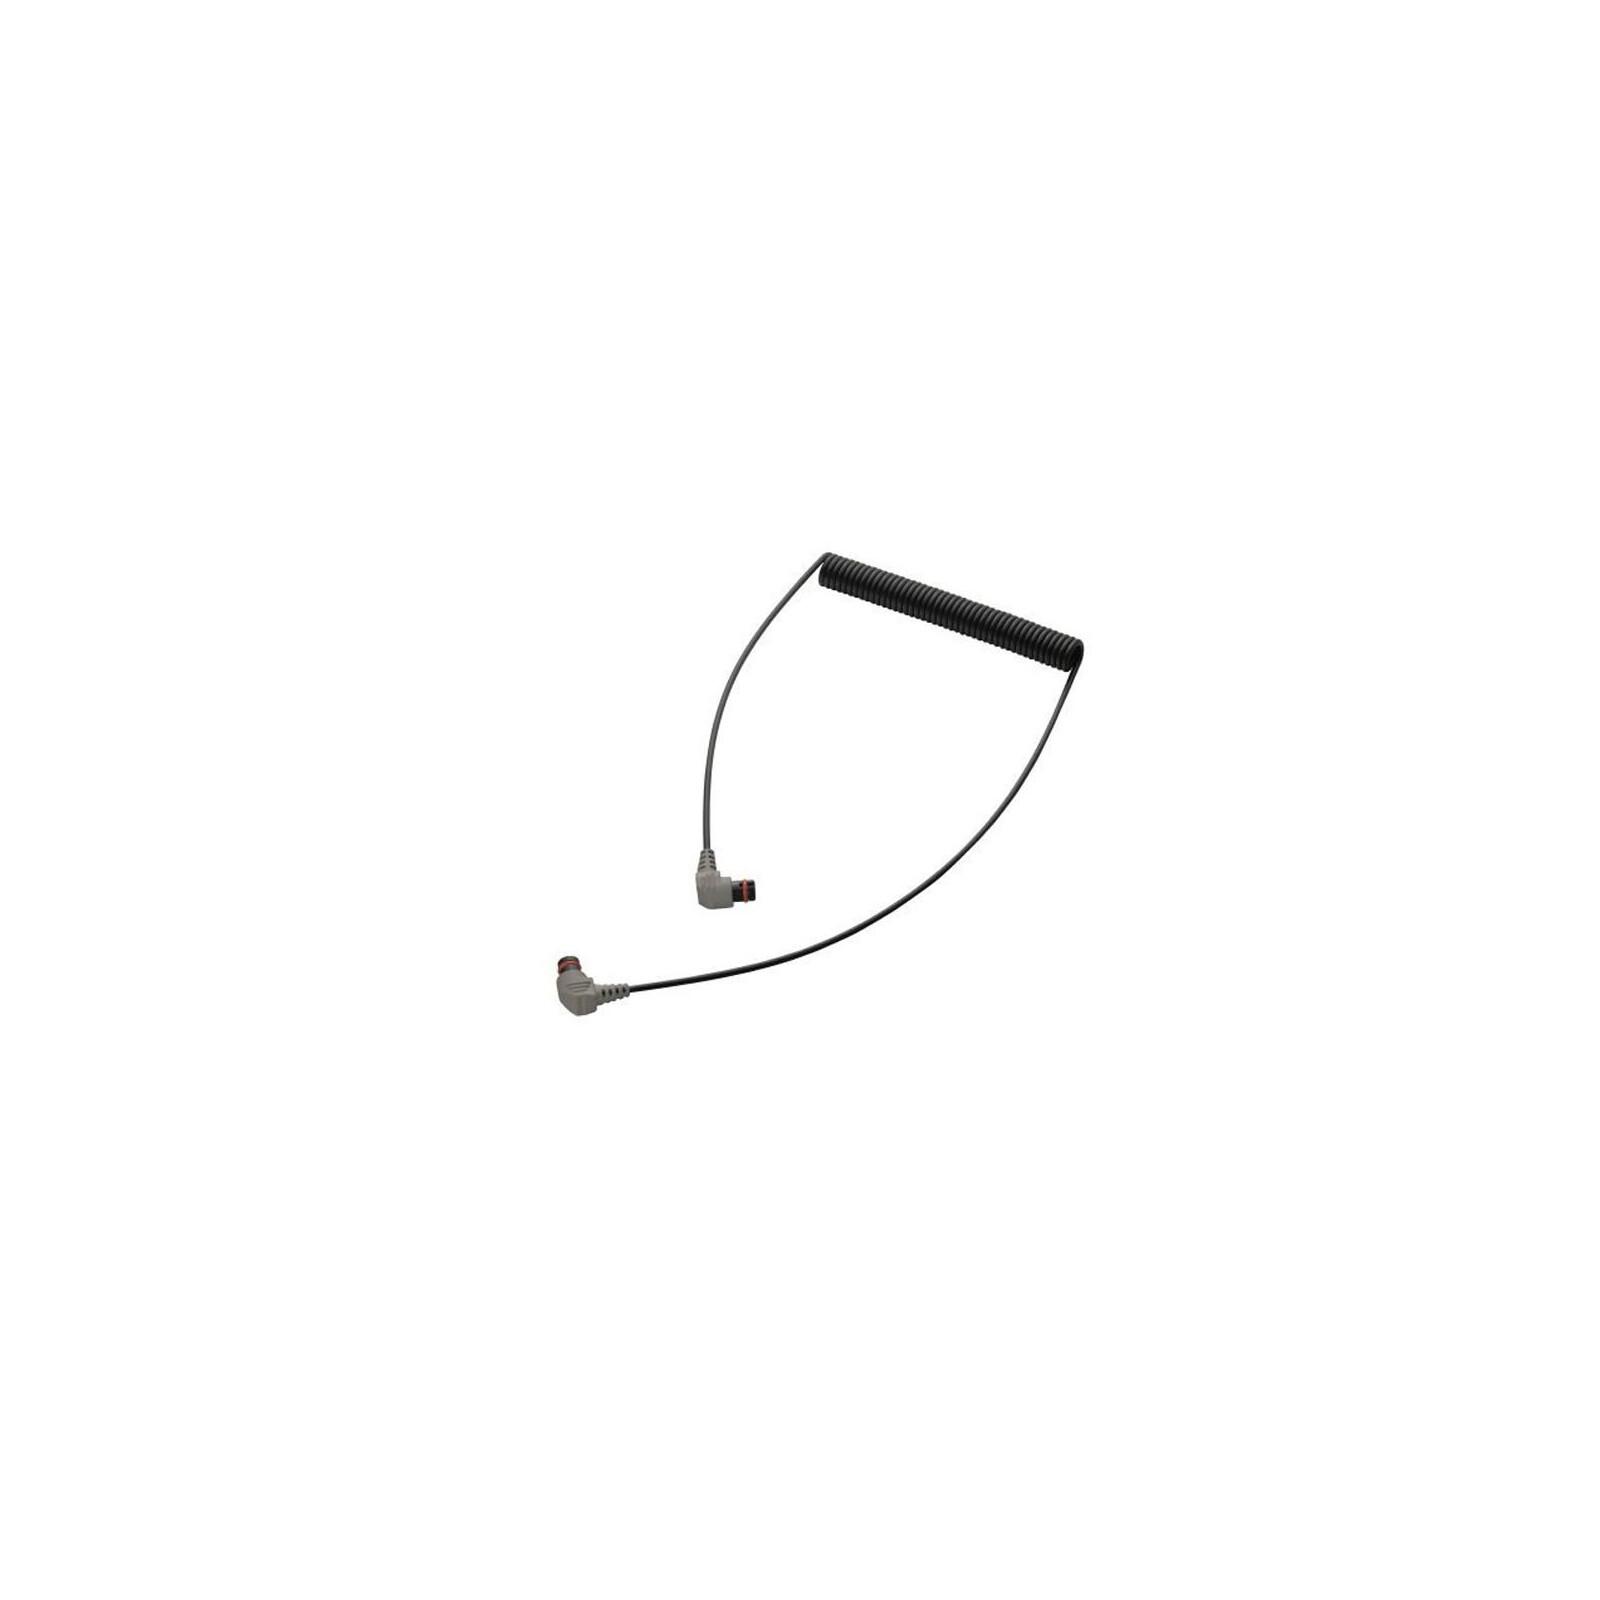 Olympus PTCB-E02 Opt. Fiber Kabel